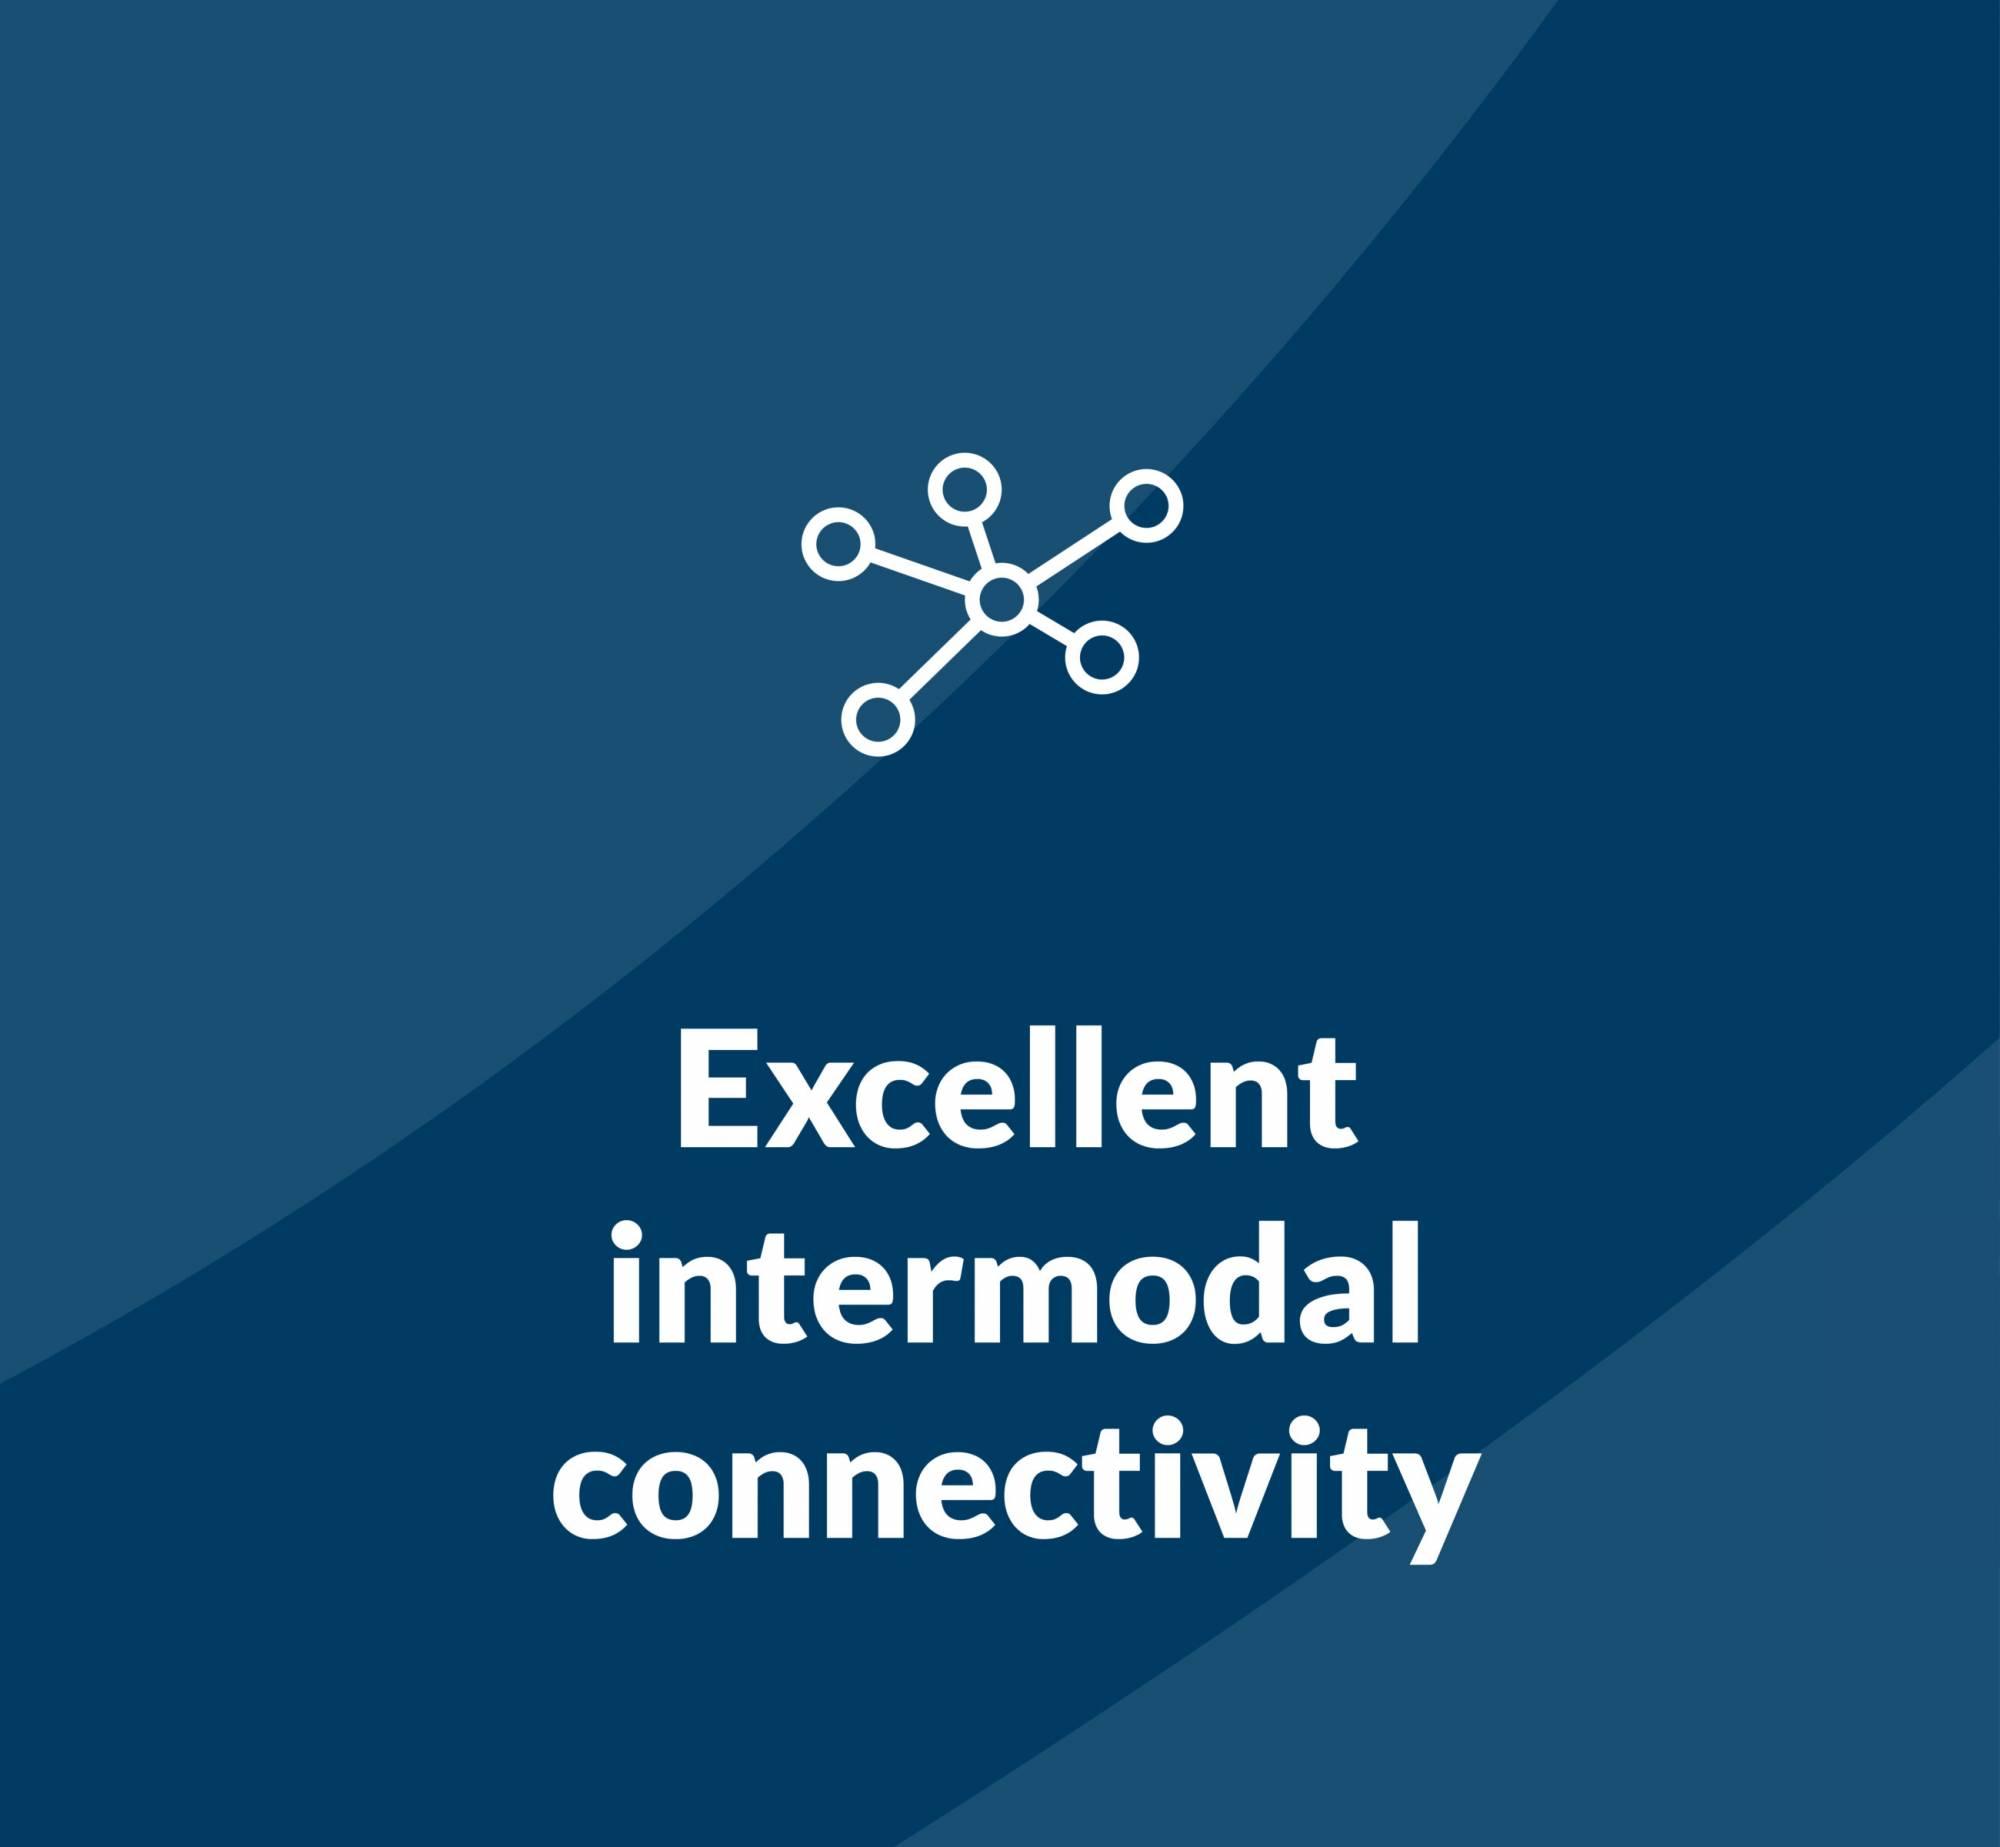 Excellent intermodal connectivity